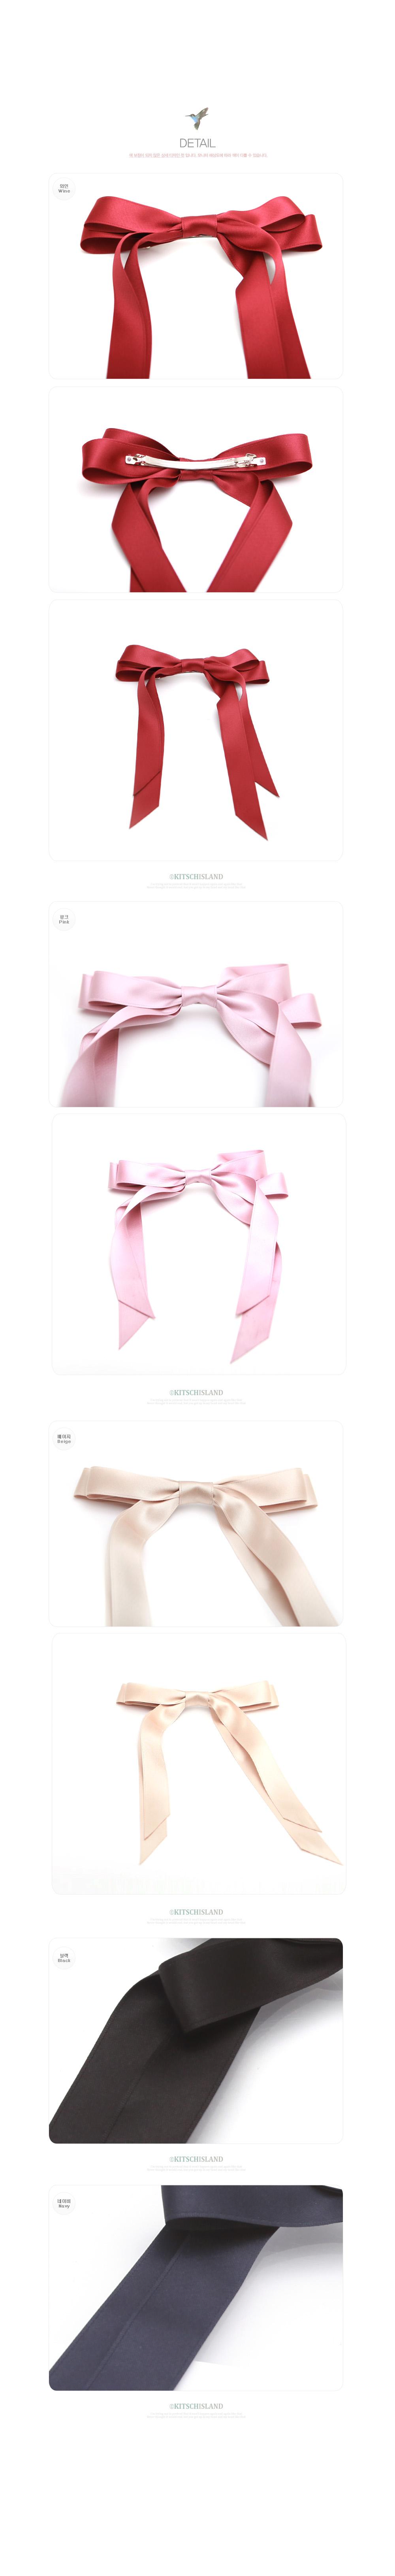 Super Ribbon 21cm 롱테일 여성 헤어핀 헤어밴드 - 키치아일랜드, 6,000원, 헤어핀/밴드/끈, 헤어핀/끈